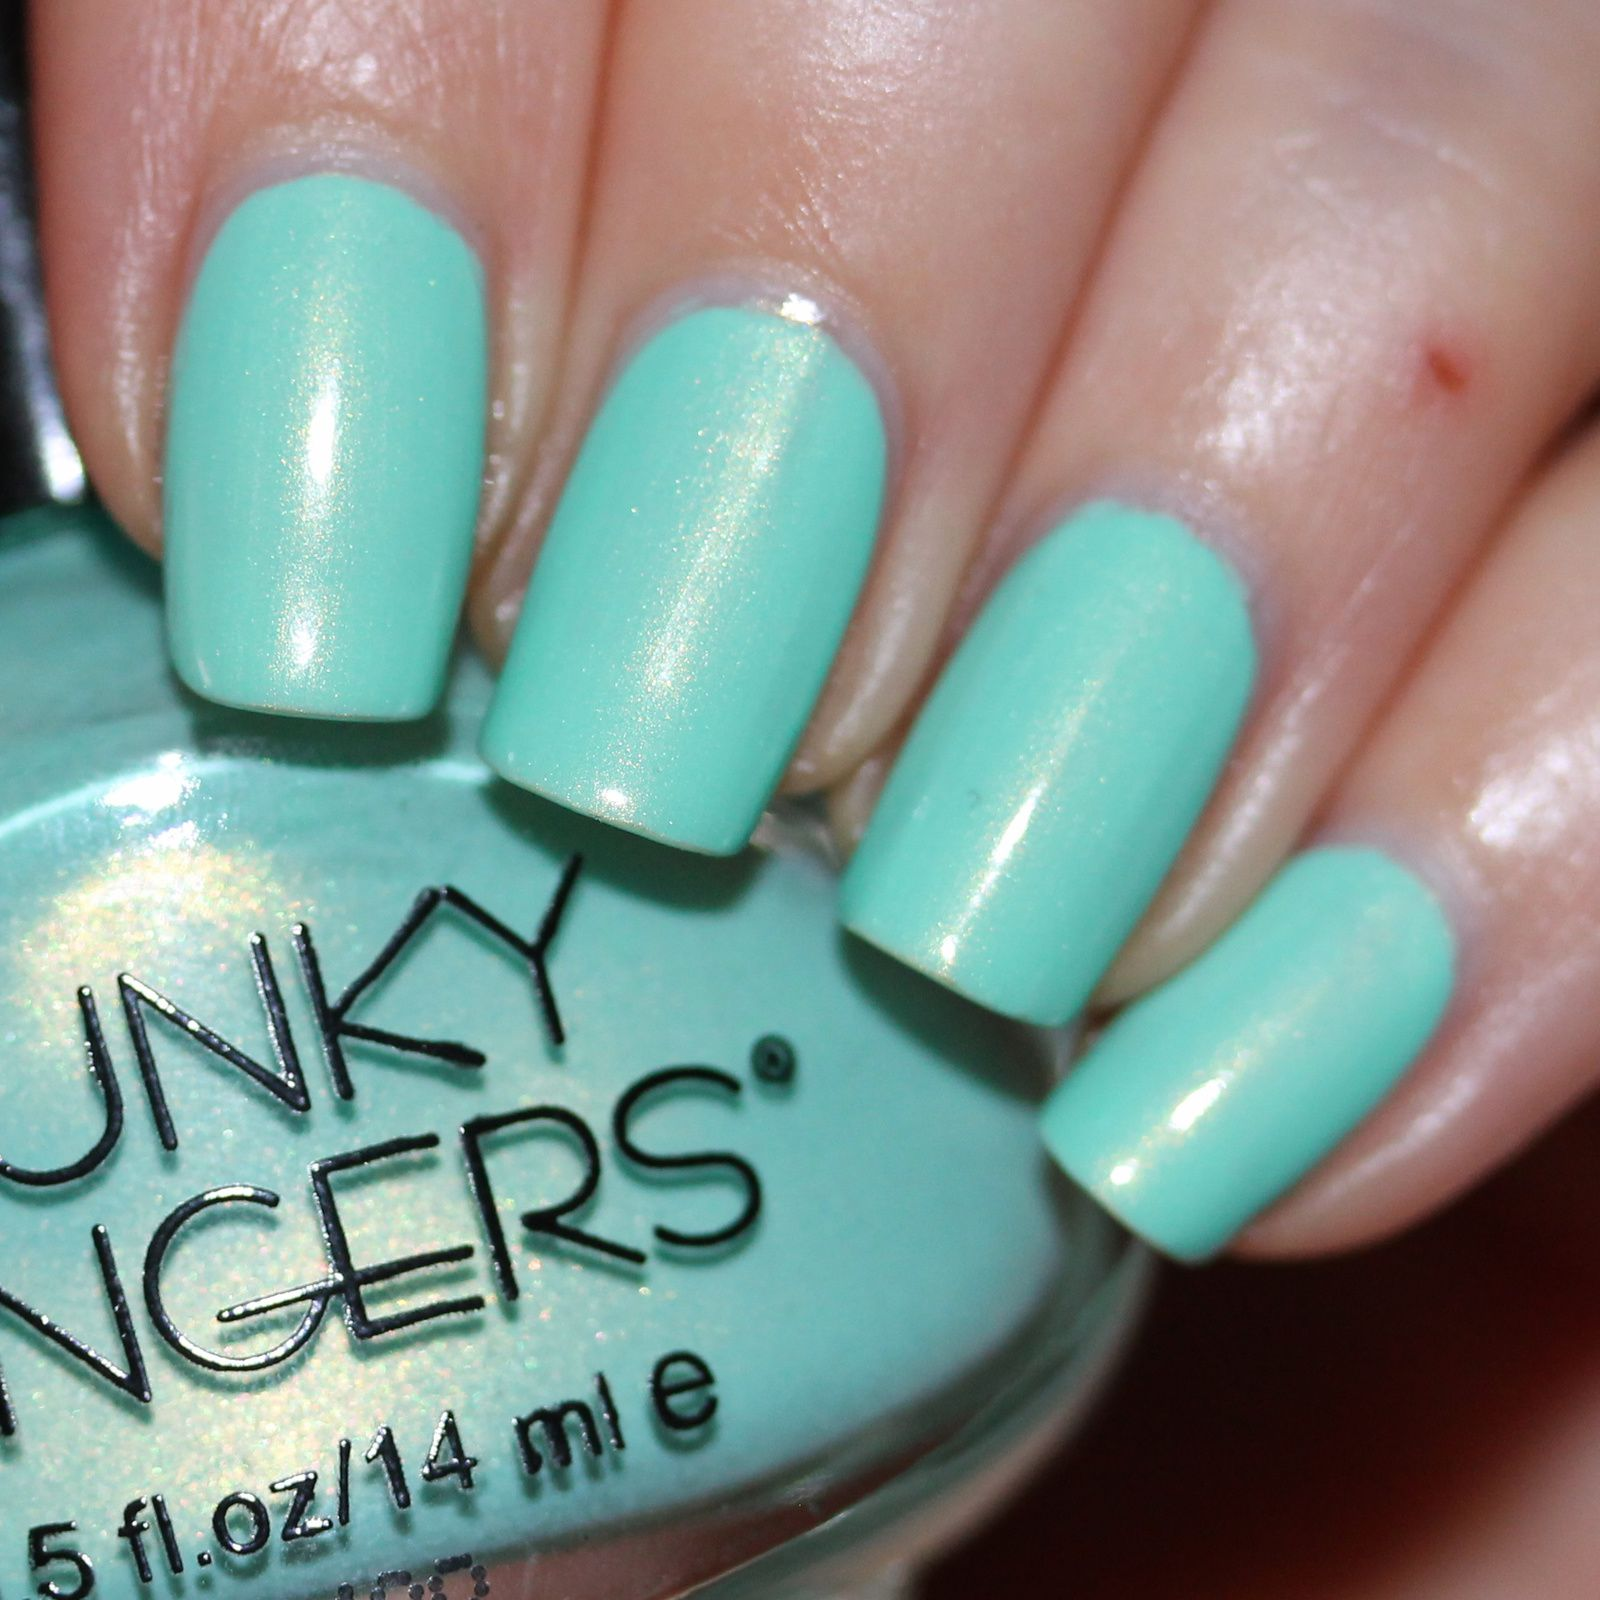 Essie Protein Base Coat / Funky Fingers Mrs. Mint / HK Girl Top Coat